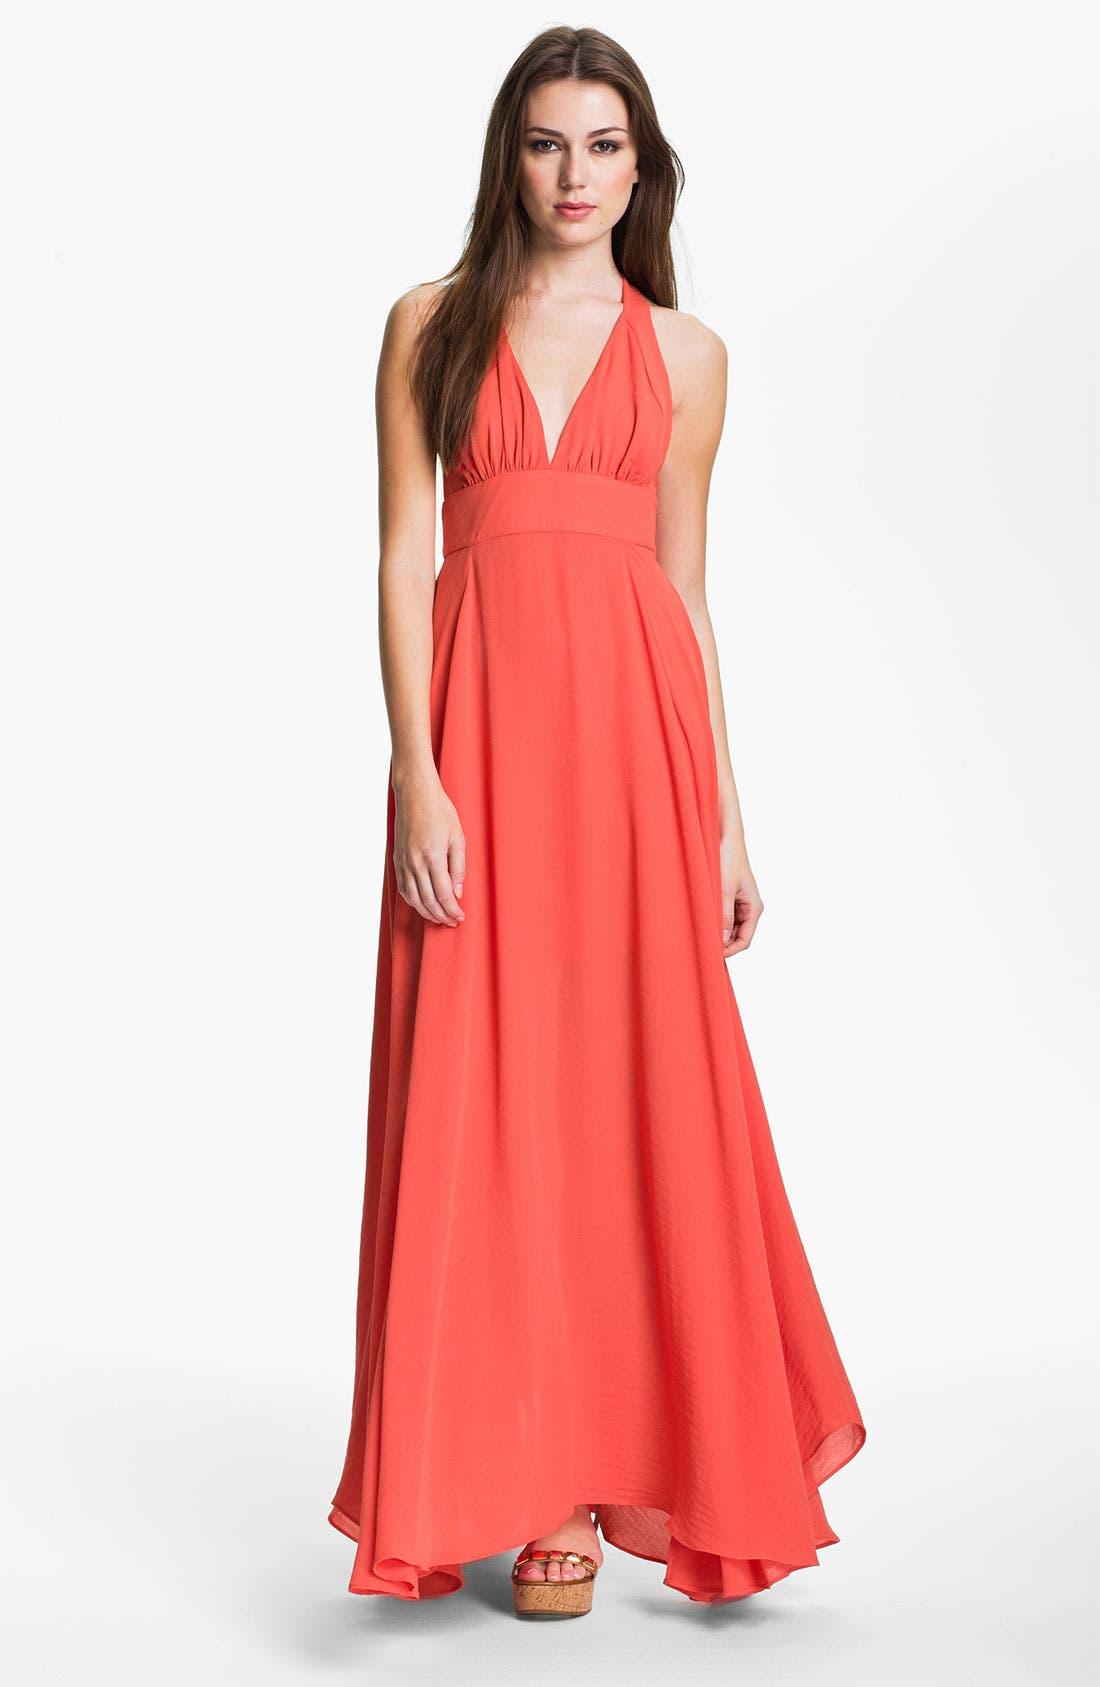 Main Image - Abi Ferrin 'Goldie' V-Neck Halter Maxi Dress